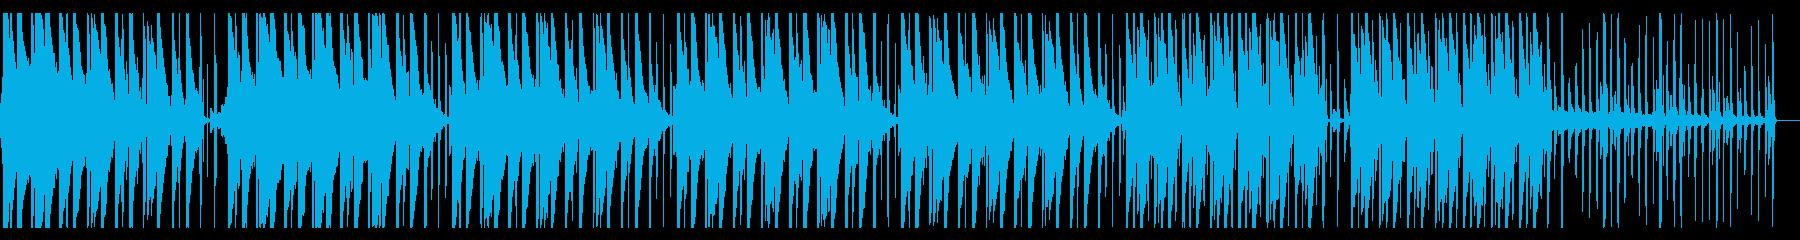 texture2の再生済みの波形